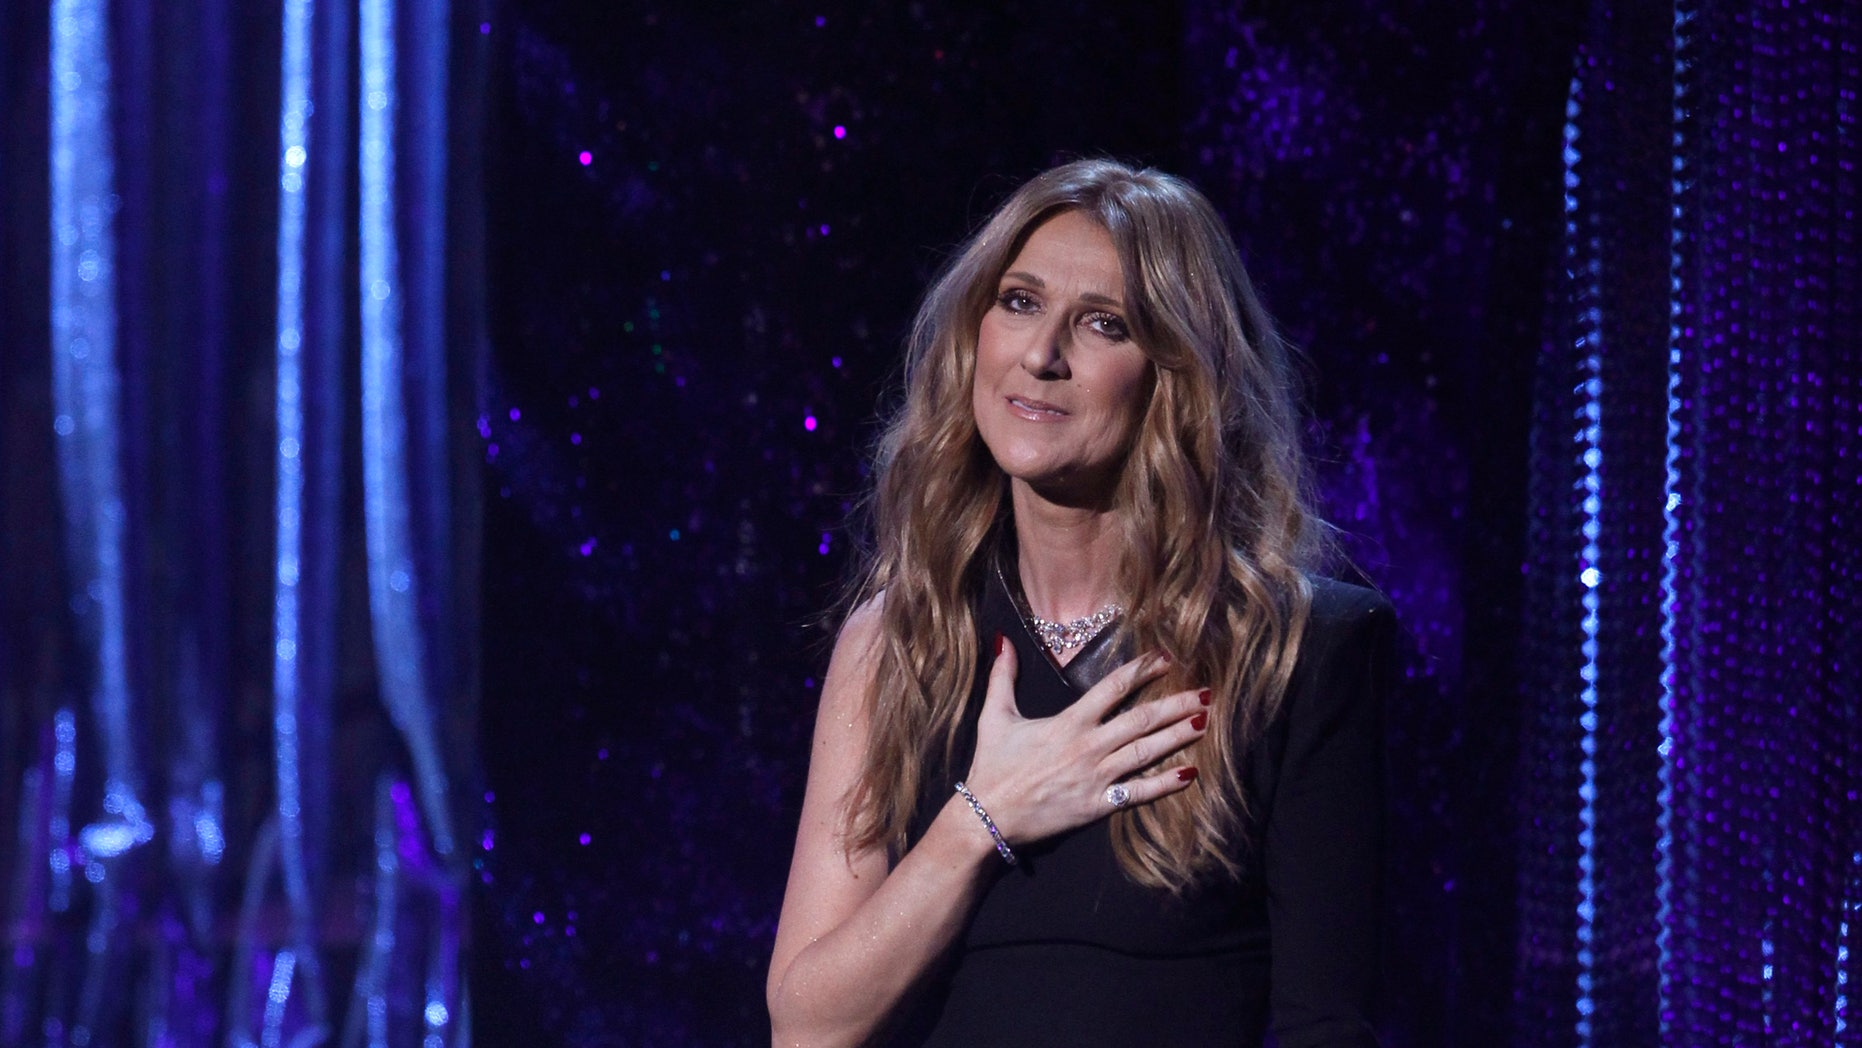 December 2, 2015. Singer Céline Dion performs during Sinatra 100 - An All-Star Grammy Concert in Las Vegas, Nevada.